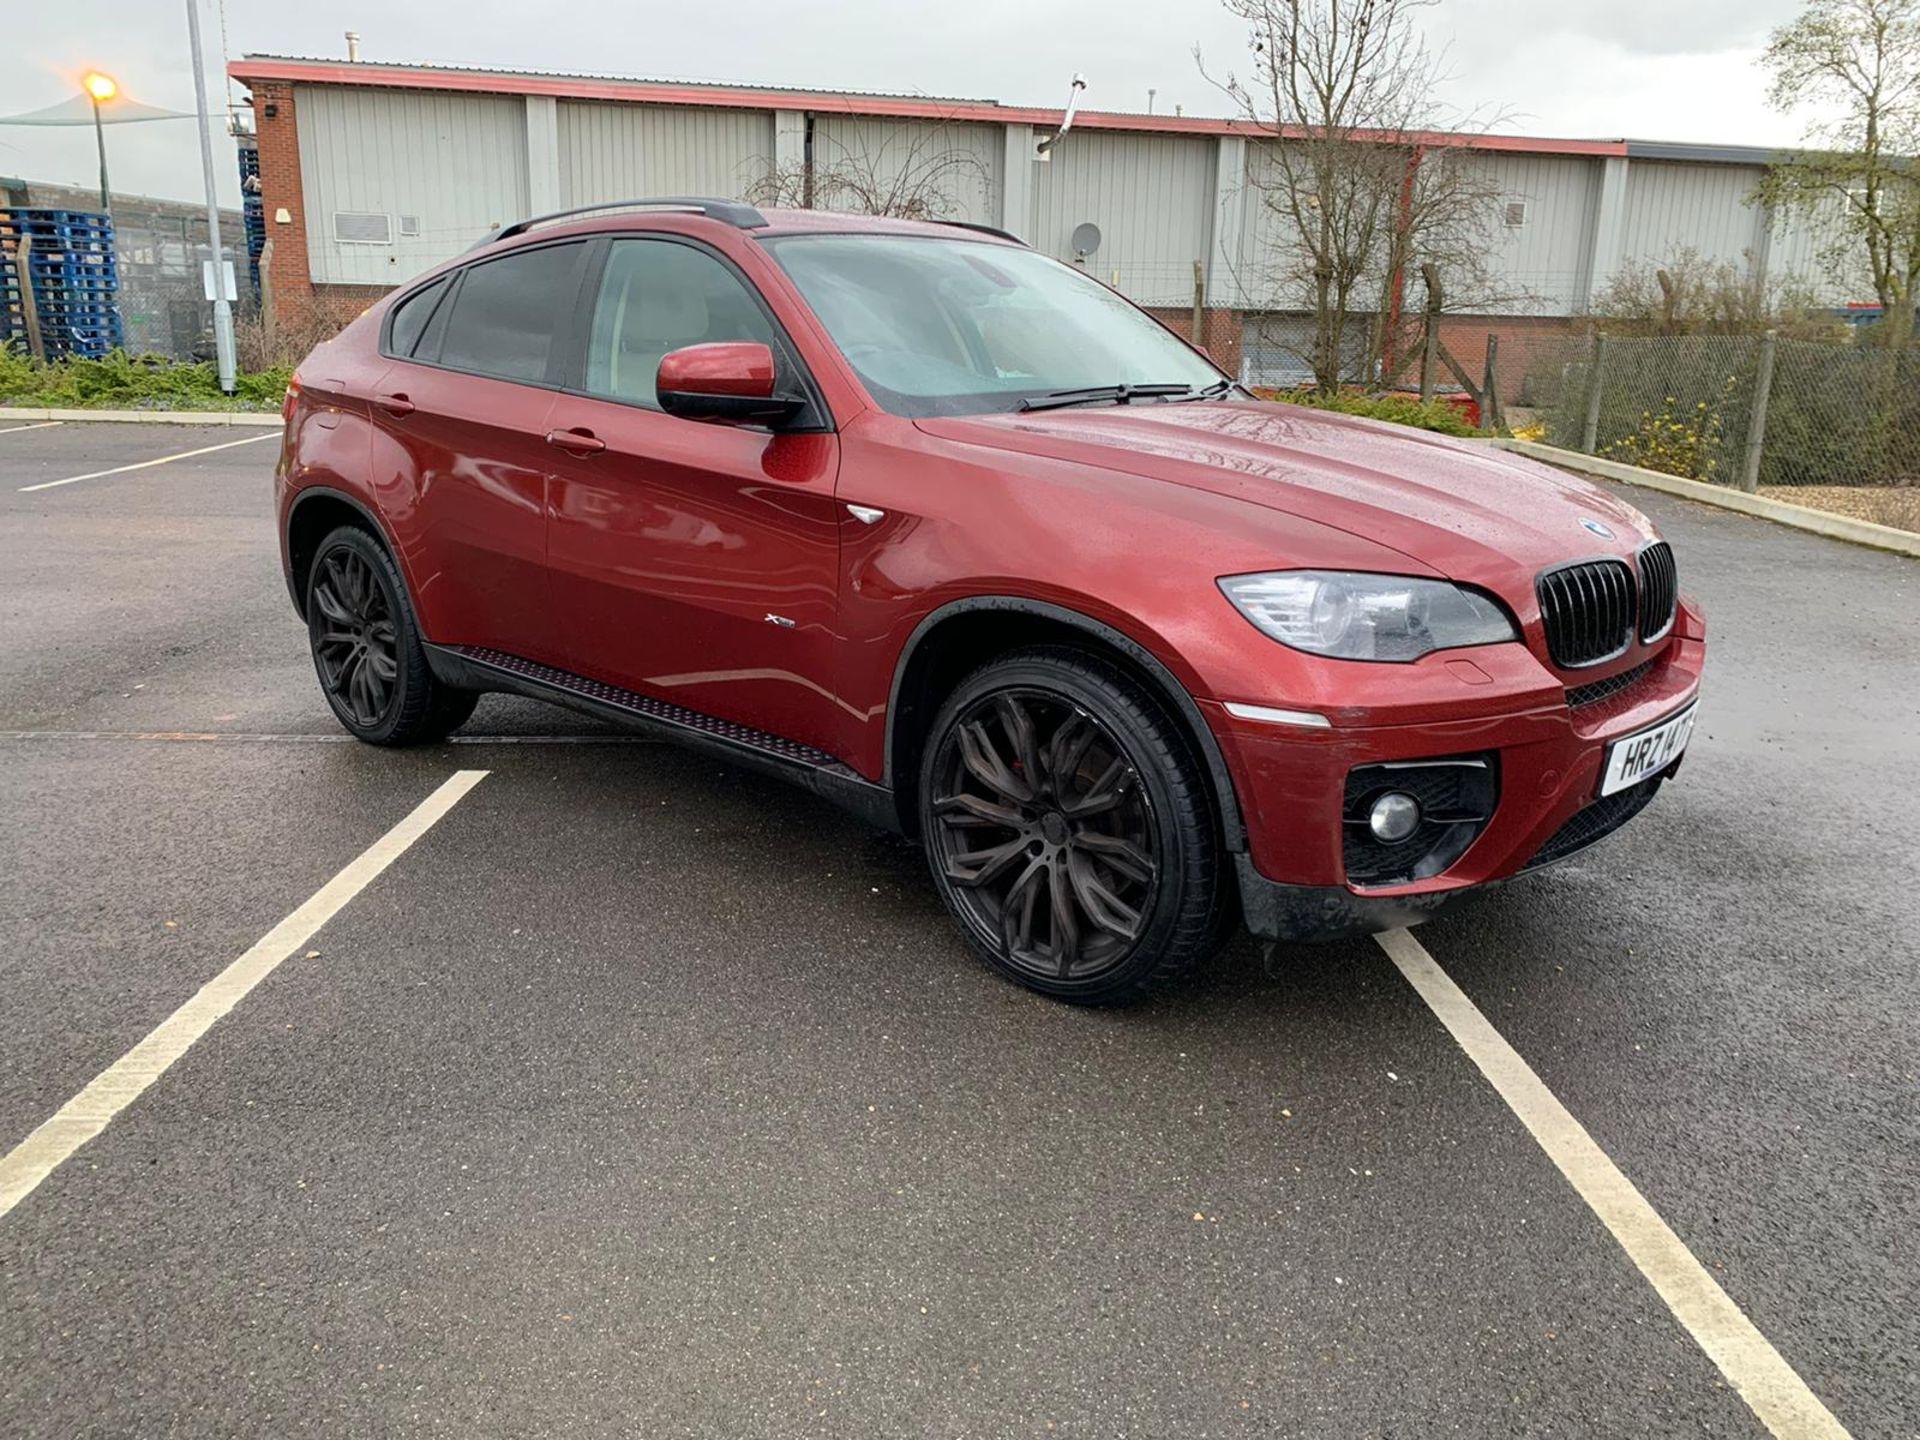 Reseve Met - BMW X6 xDrive 3.0d Auto - 2014 Reg - Leather Interior -Parking Sensors - Reversing Cam - Image 8 of 30